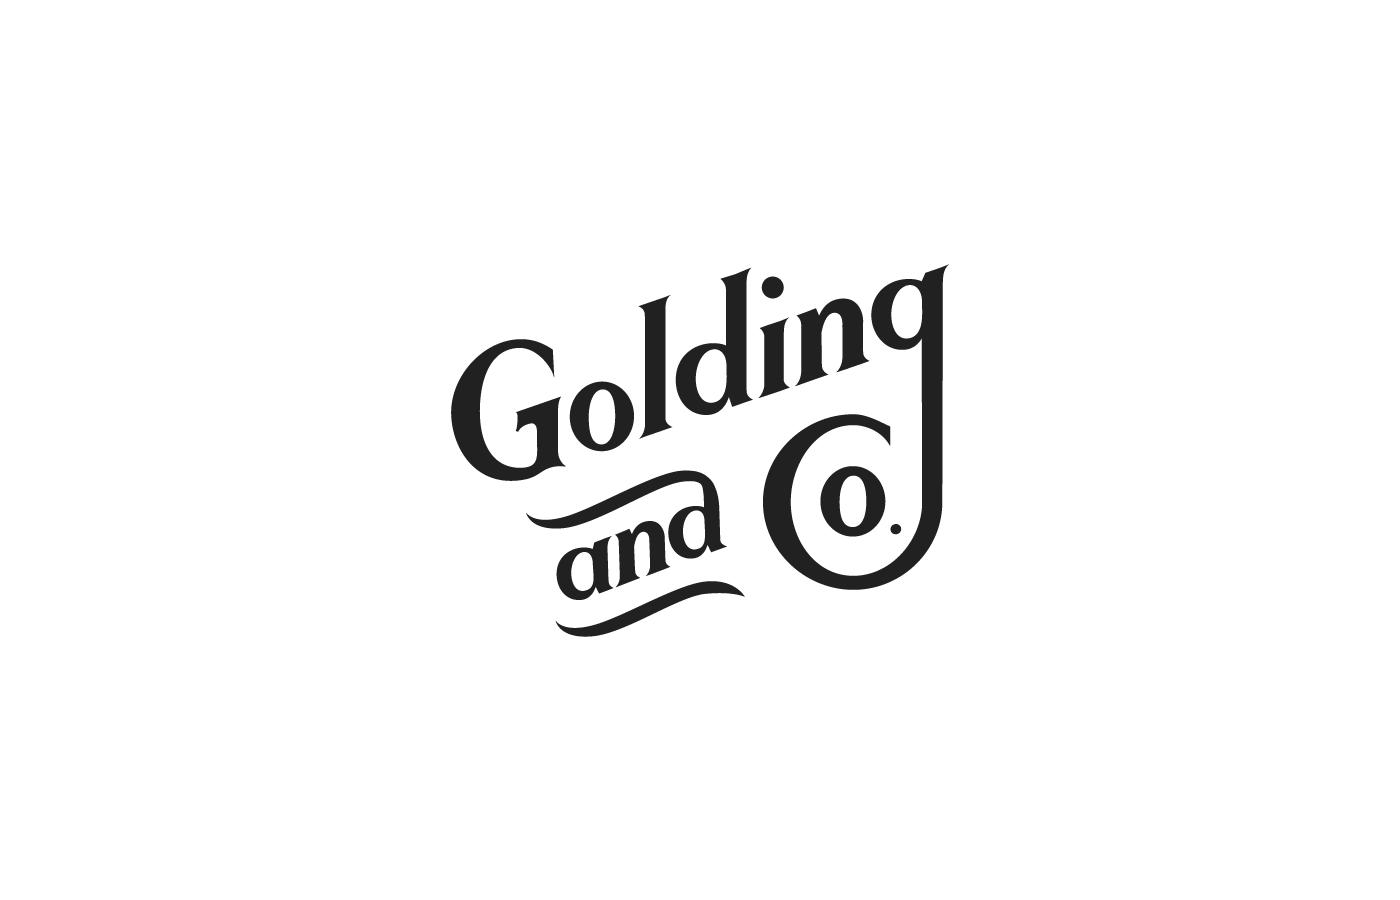 goldingco.png